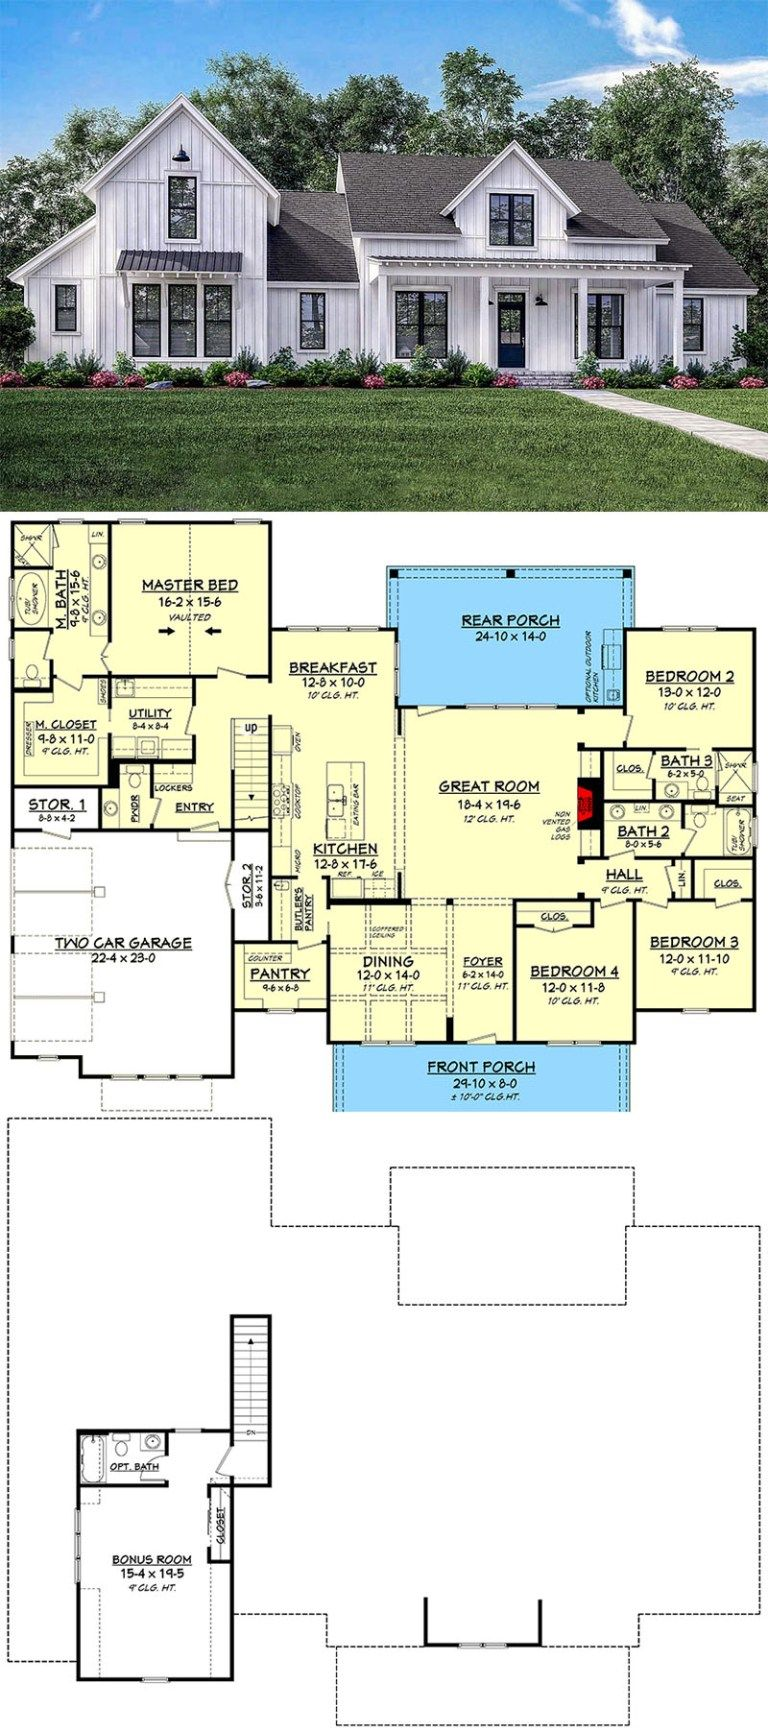 7 Most Popular Farmhouse Plans With Pictures Nikki S Plate House Plans Farmhouse Farmhouse Plans House Blueprints